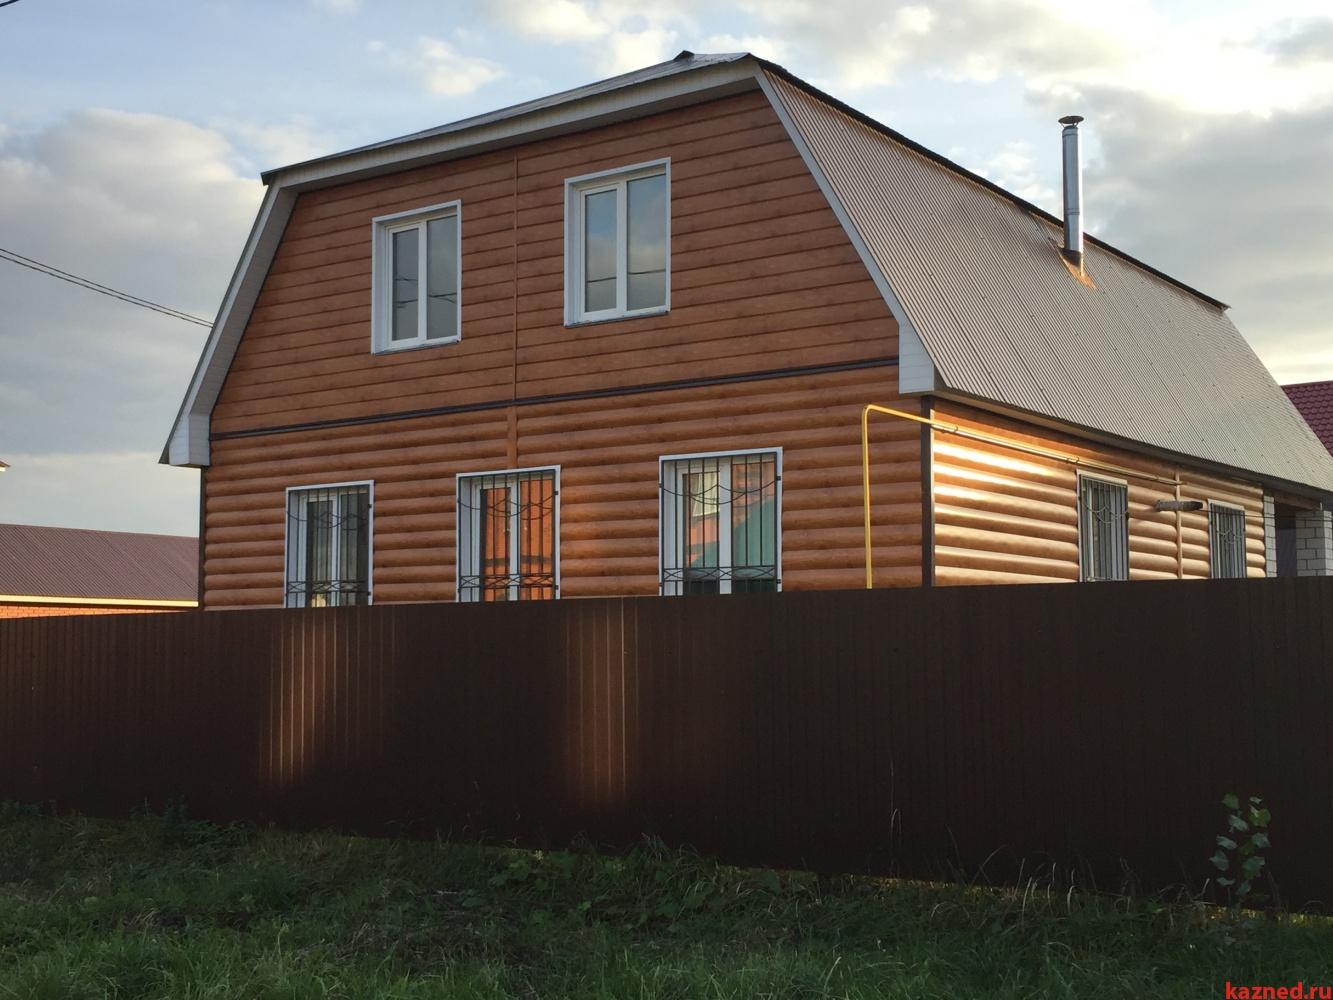 Продажа  дома константиновка ул казанская, 160 м²  (миниатюра №1)